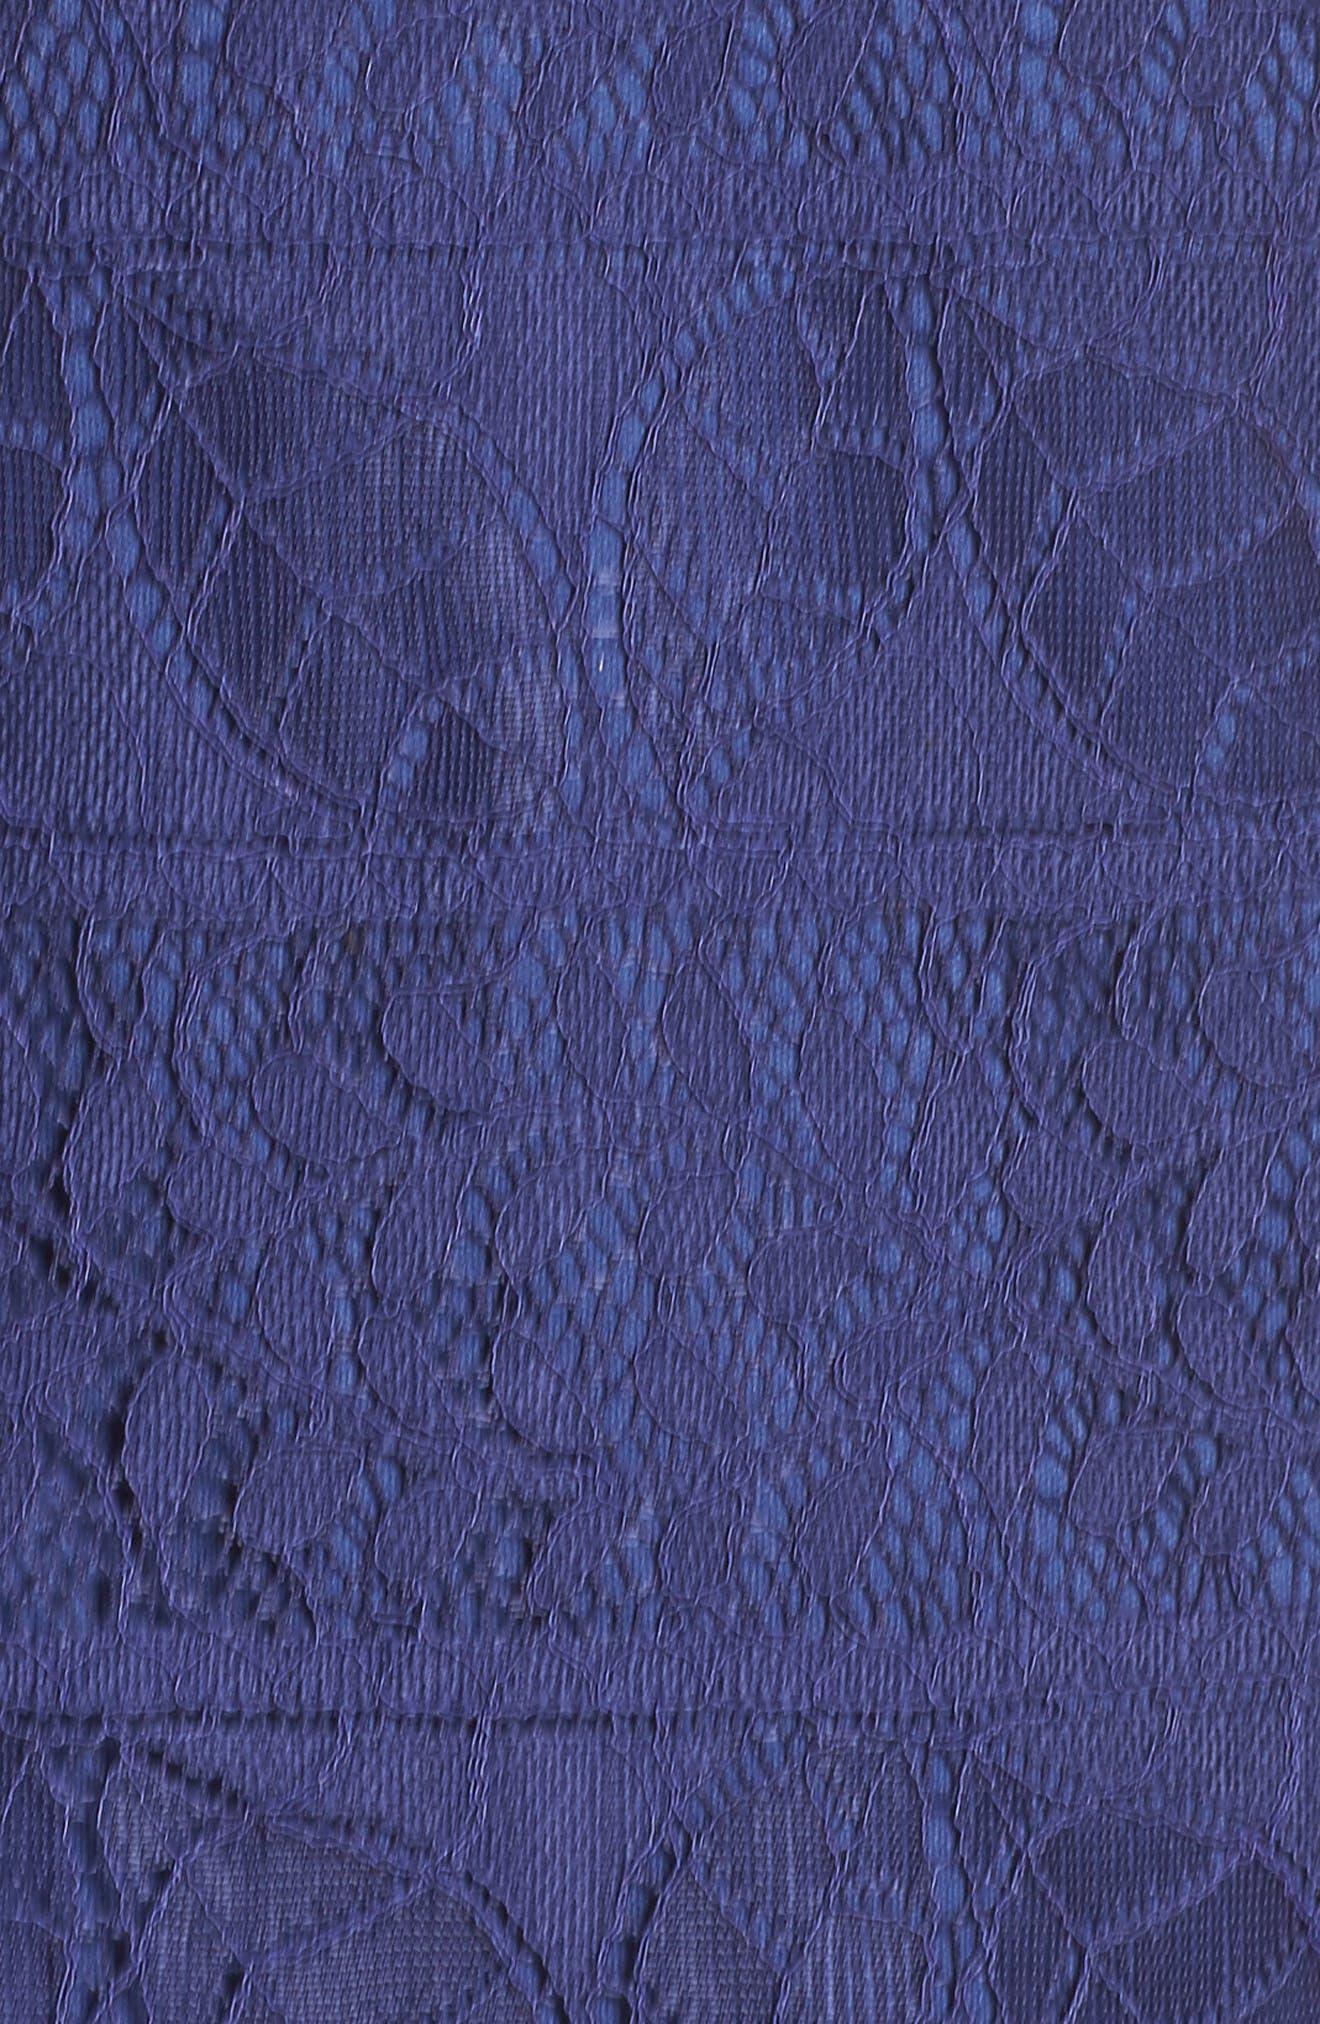 Off the Shoulder Lace Dress,                             Alternate thumbnail 5, color,                             Navy